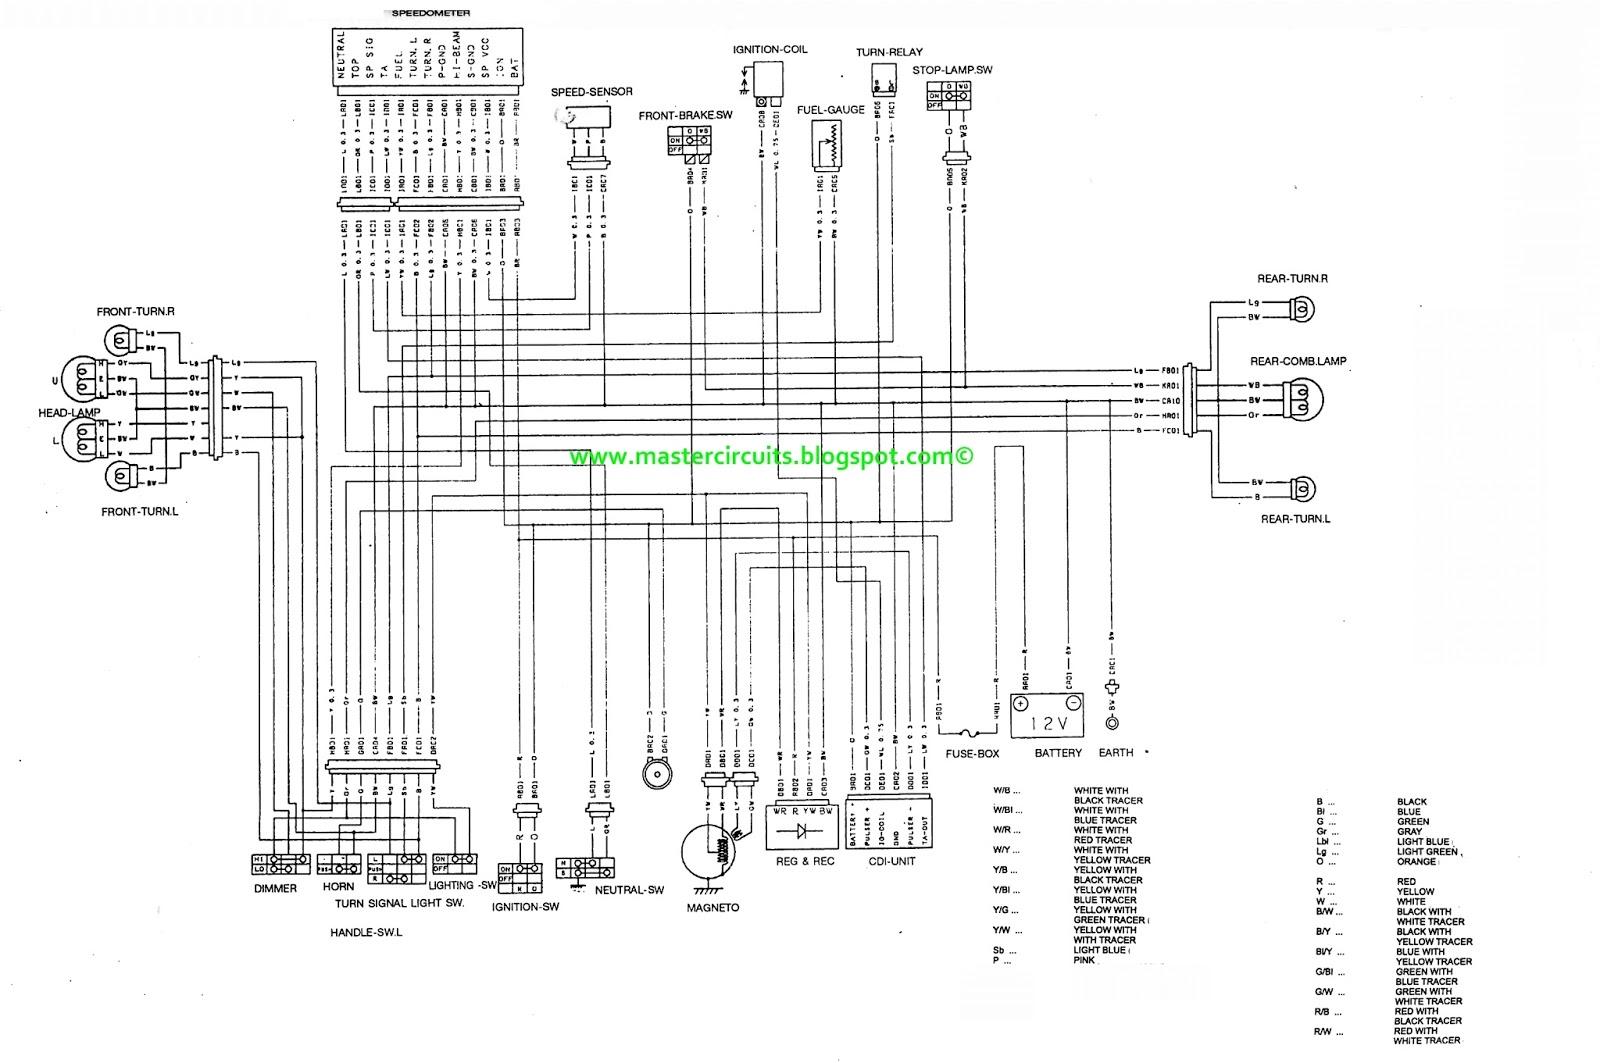 Quadrunner 160 Wiring Diagram 04 Dodge Grand Caravan Wiring Lasko ...